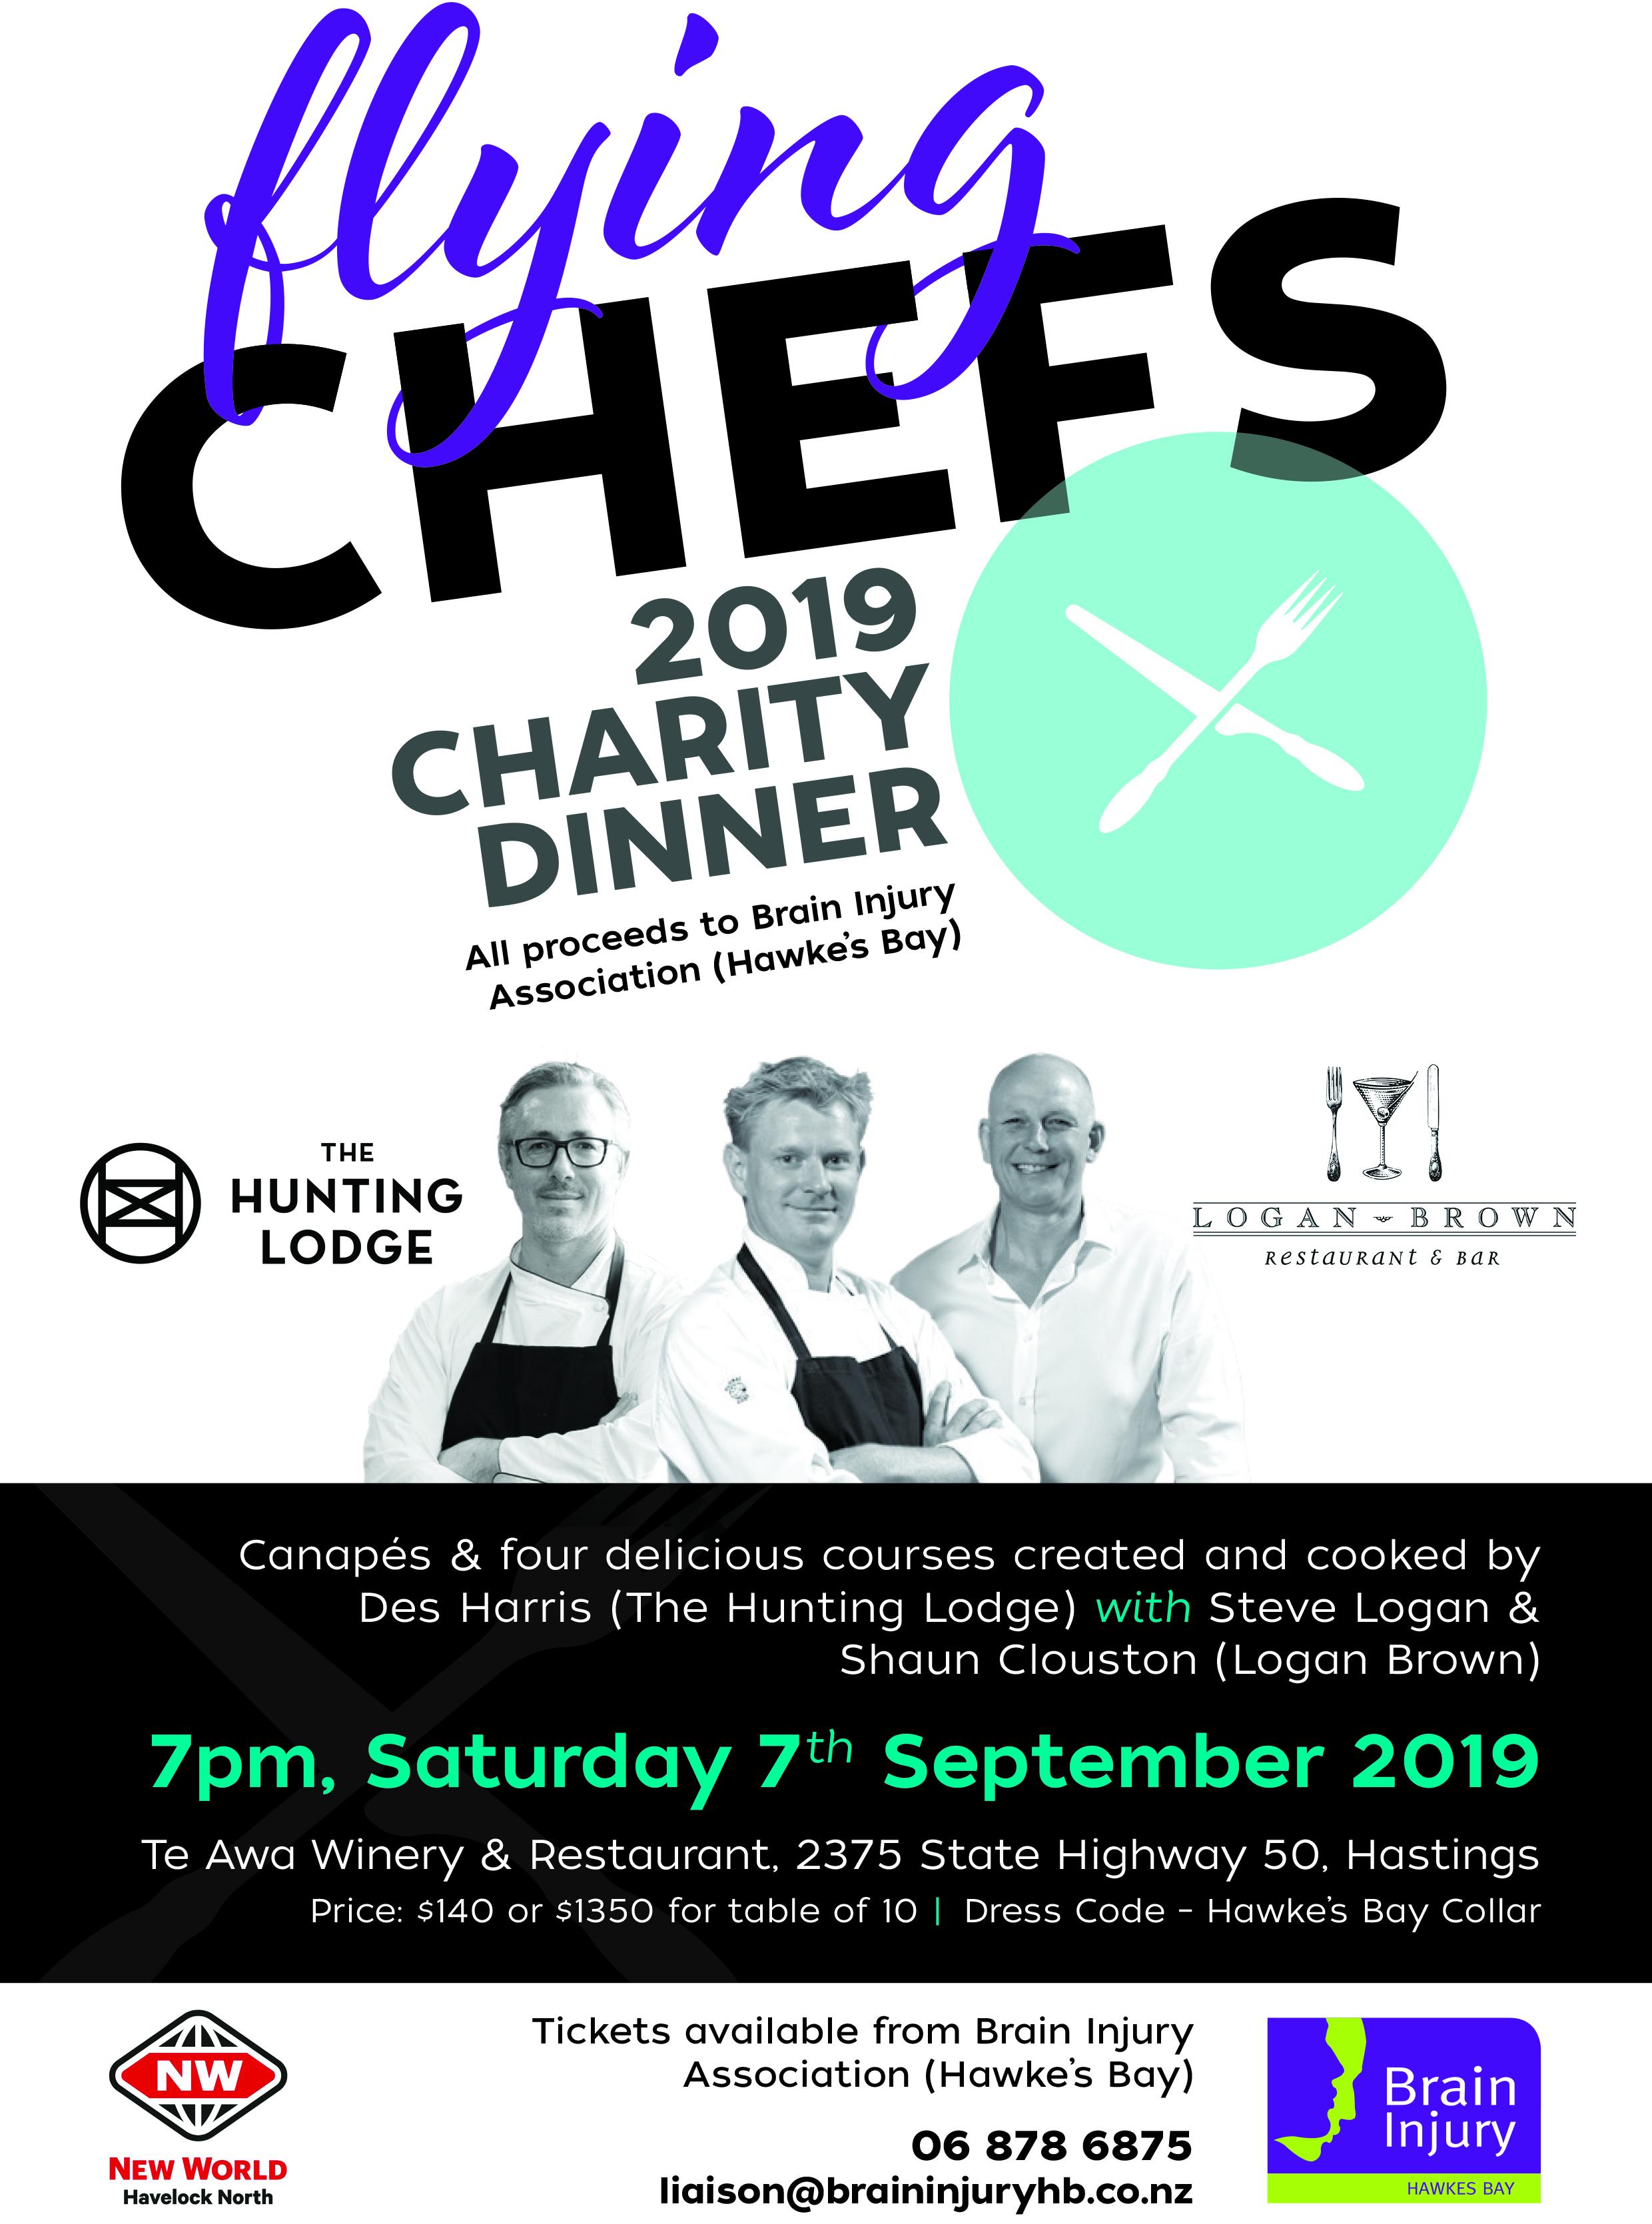 Flying Chefs 2019.jpg